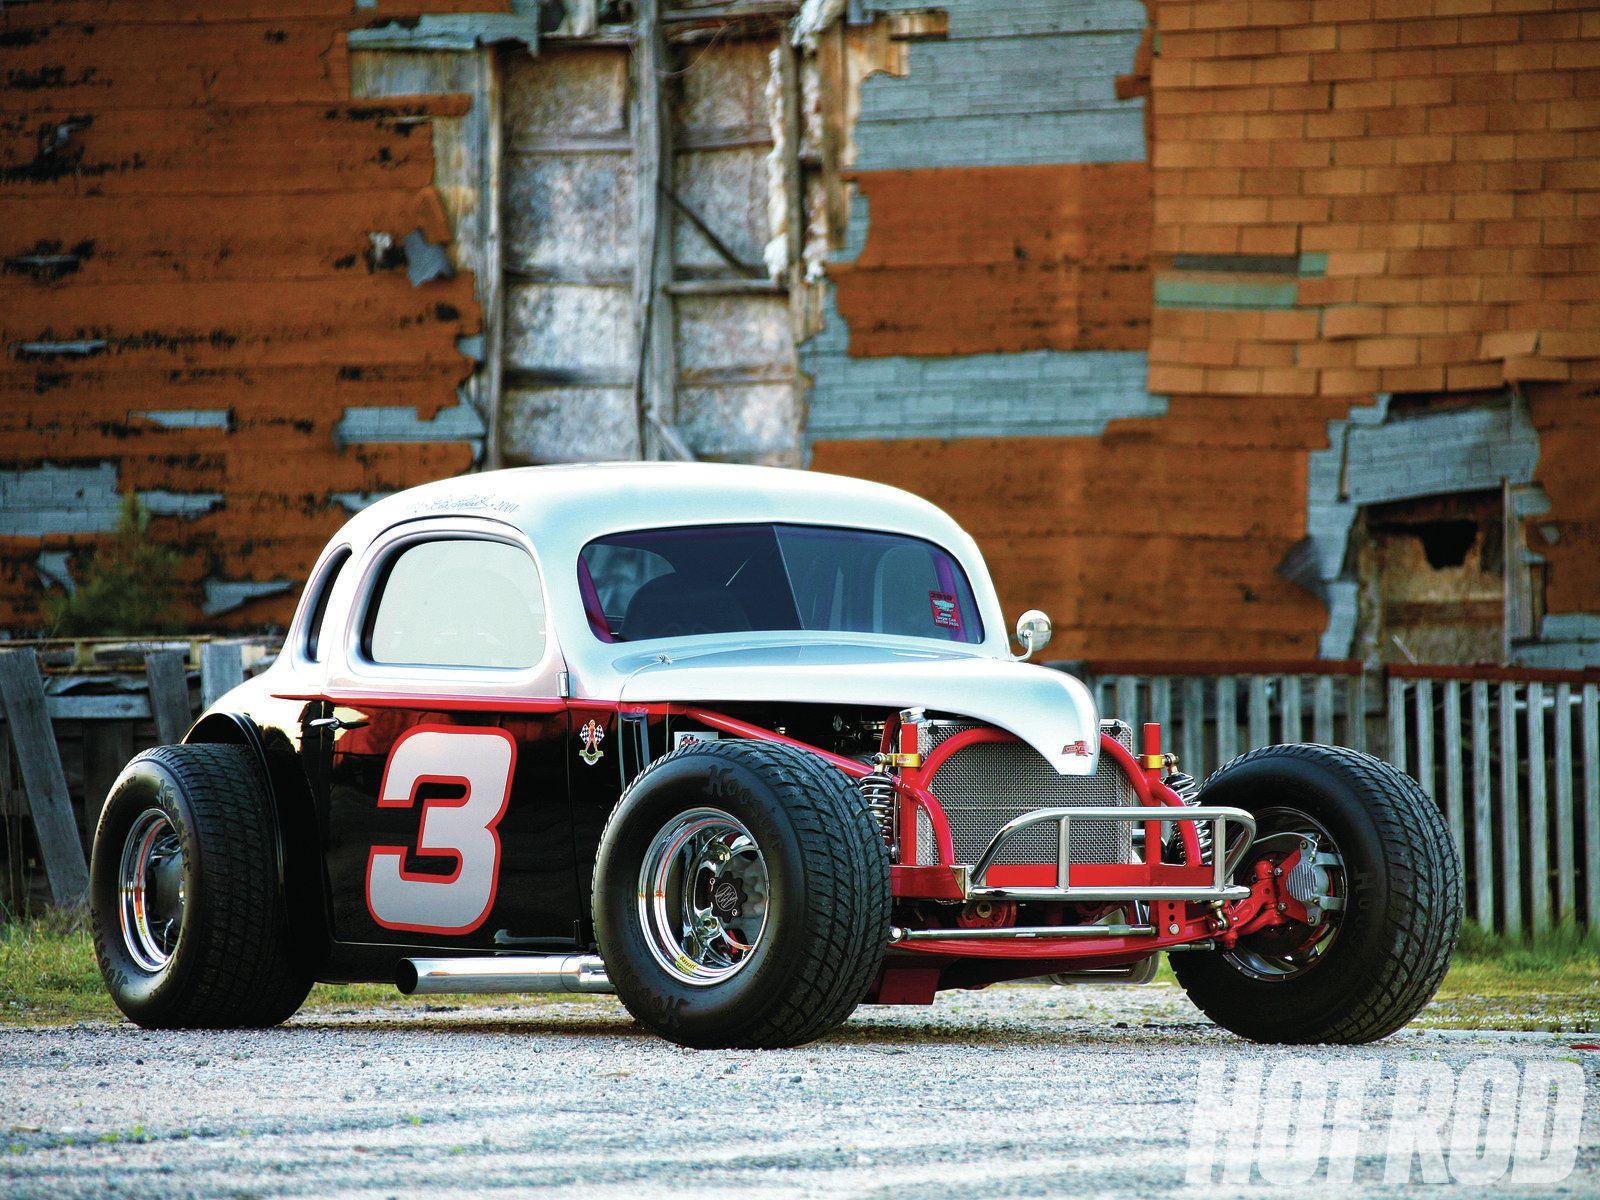 1960s NASCAR images - Google Search   Vintage Road &Track Racing ...